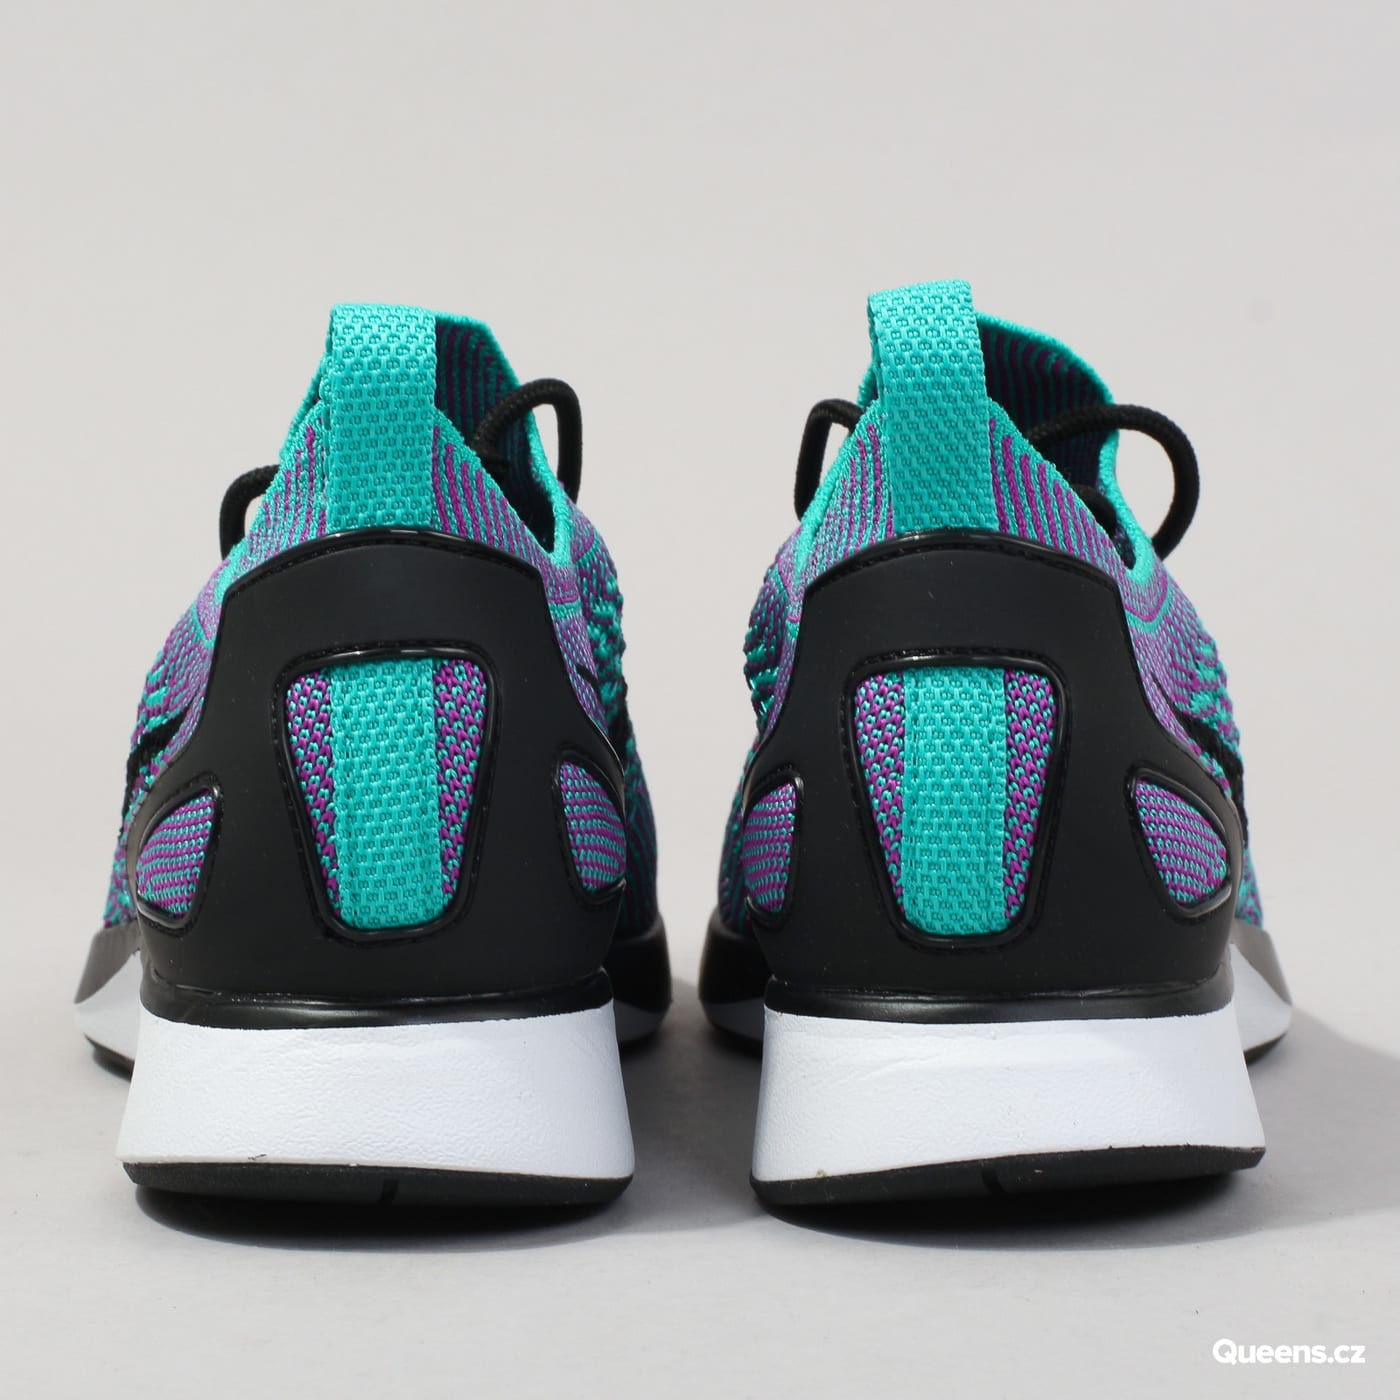 387329f54de Zoom in Zoom in Zoom in Zoom in Zoom in. Nike W Air Zoom Mariah FK Racer  Premium clear jade   black - vivid purple